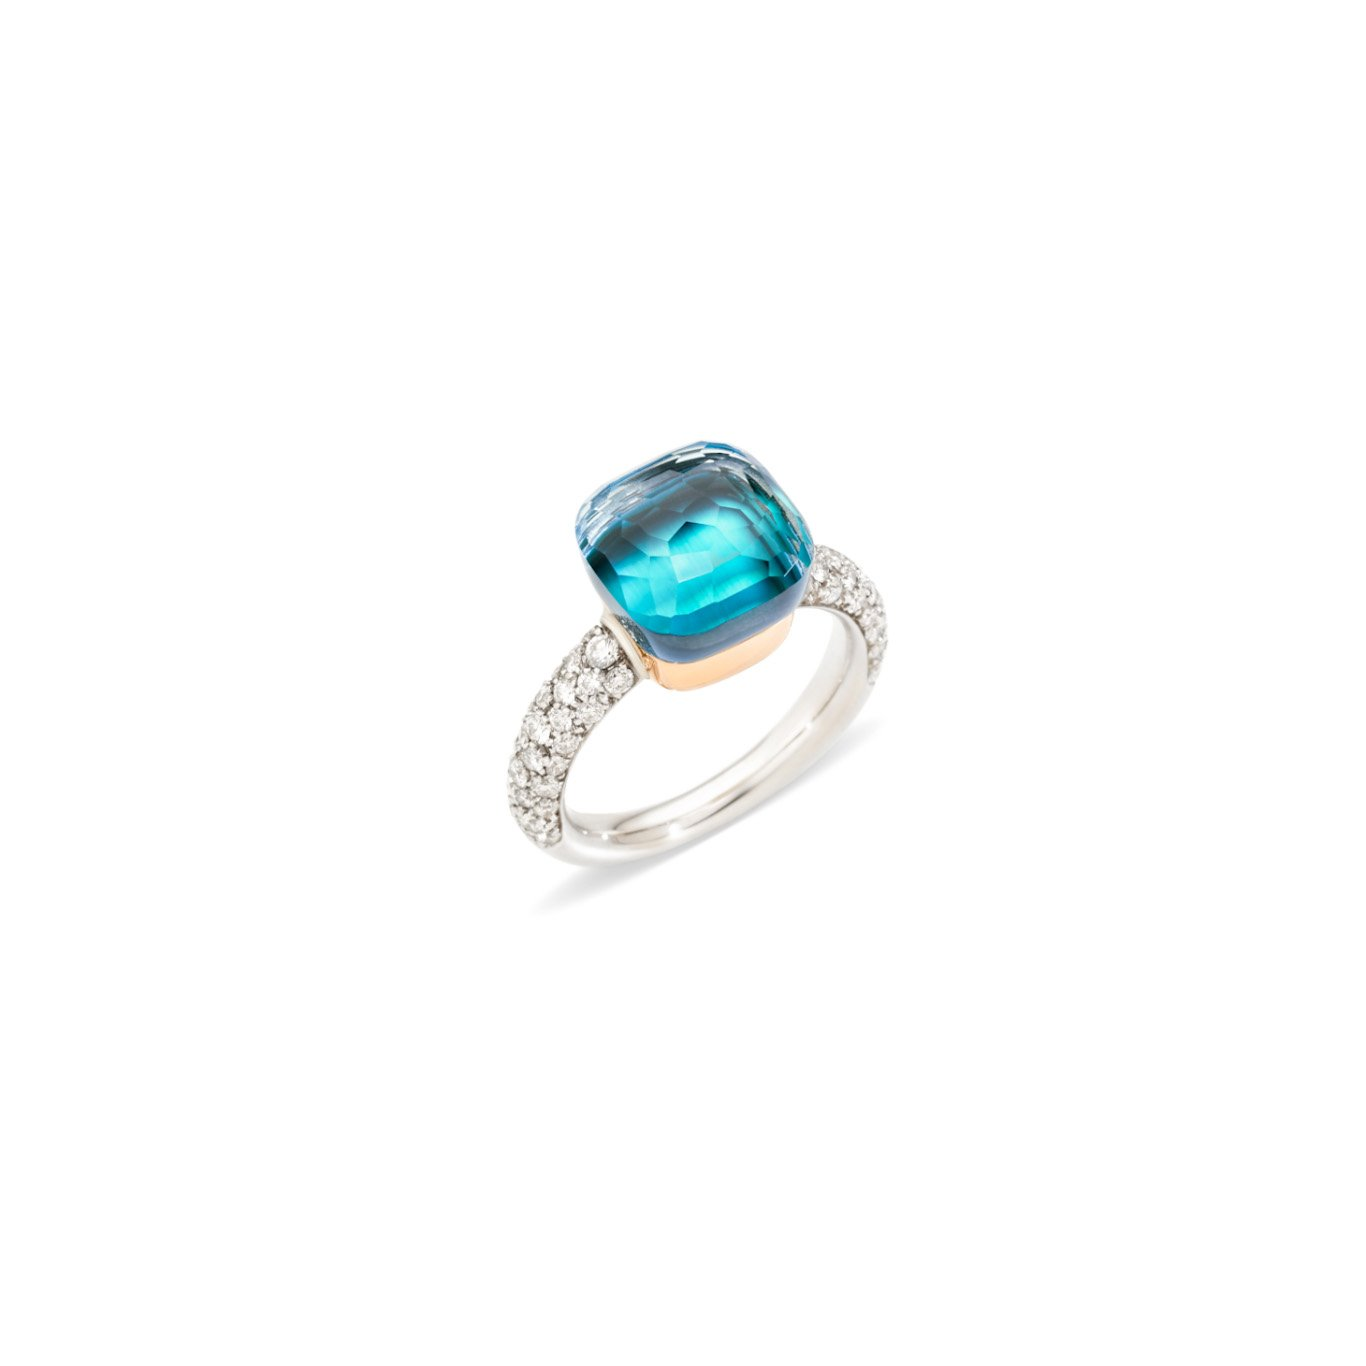 Ring nudo blauwe topaaz diamant